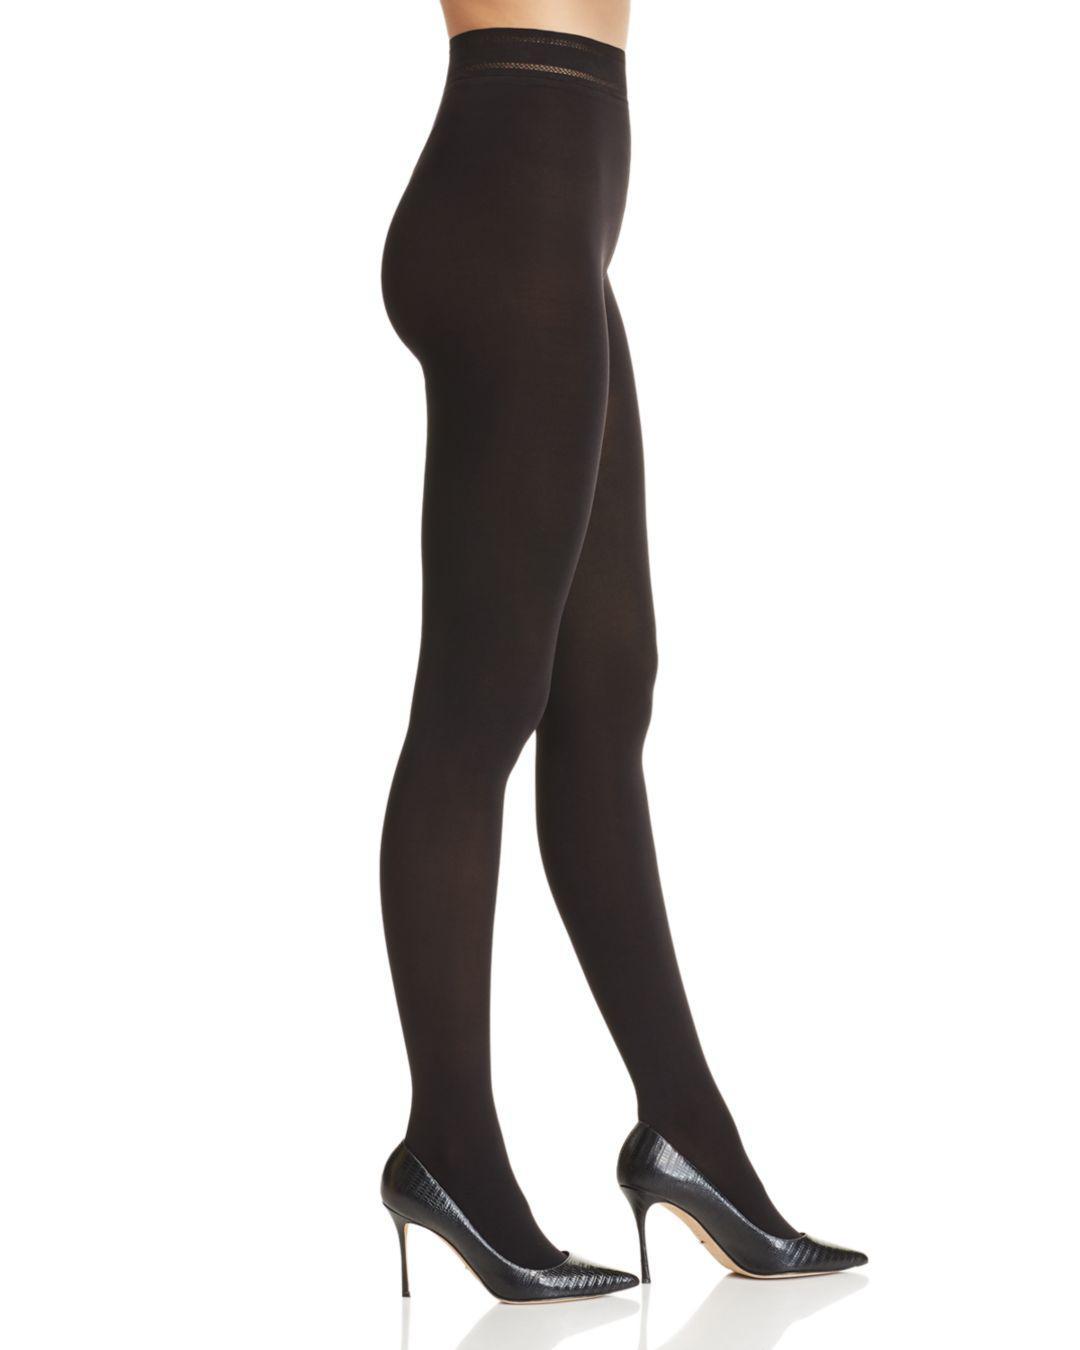 7c0847e928 Donna Karan Matte Jersey Opaque Tights in Black - Lyst